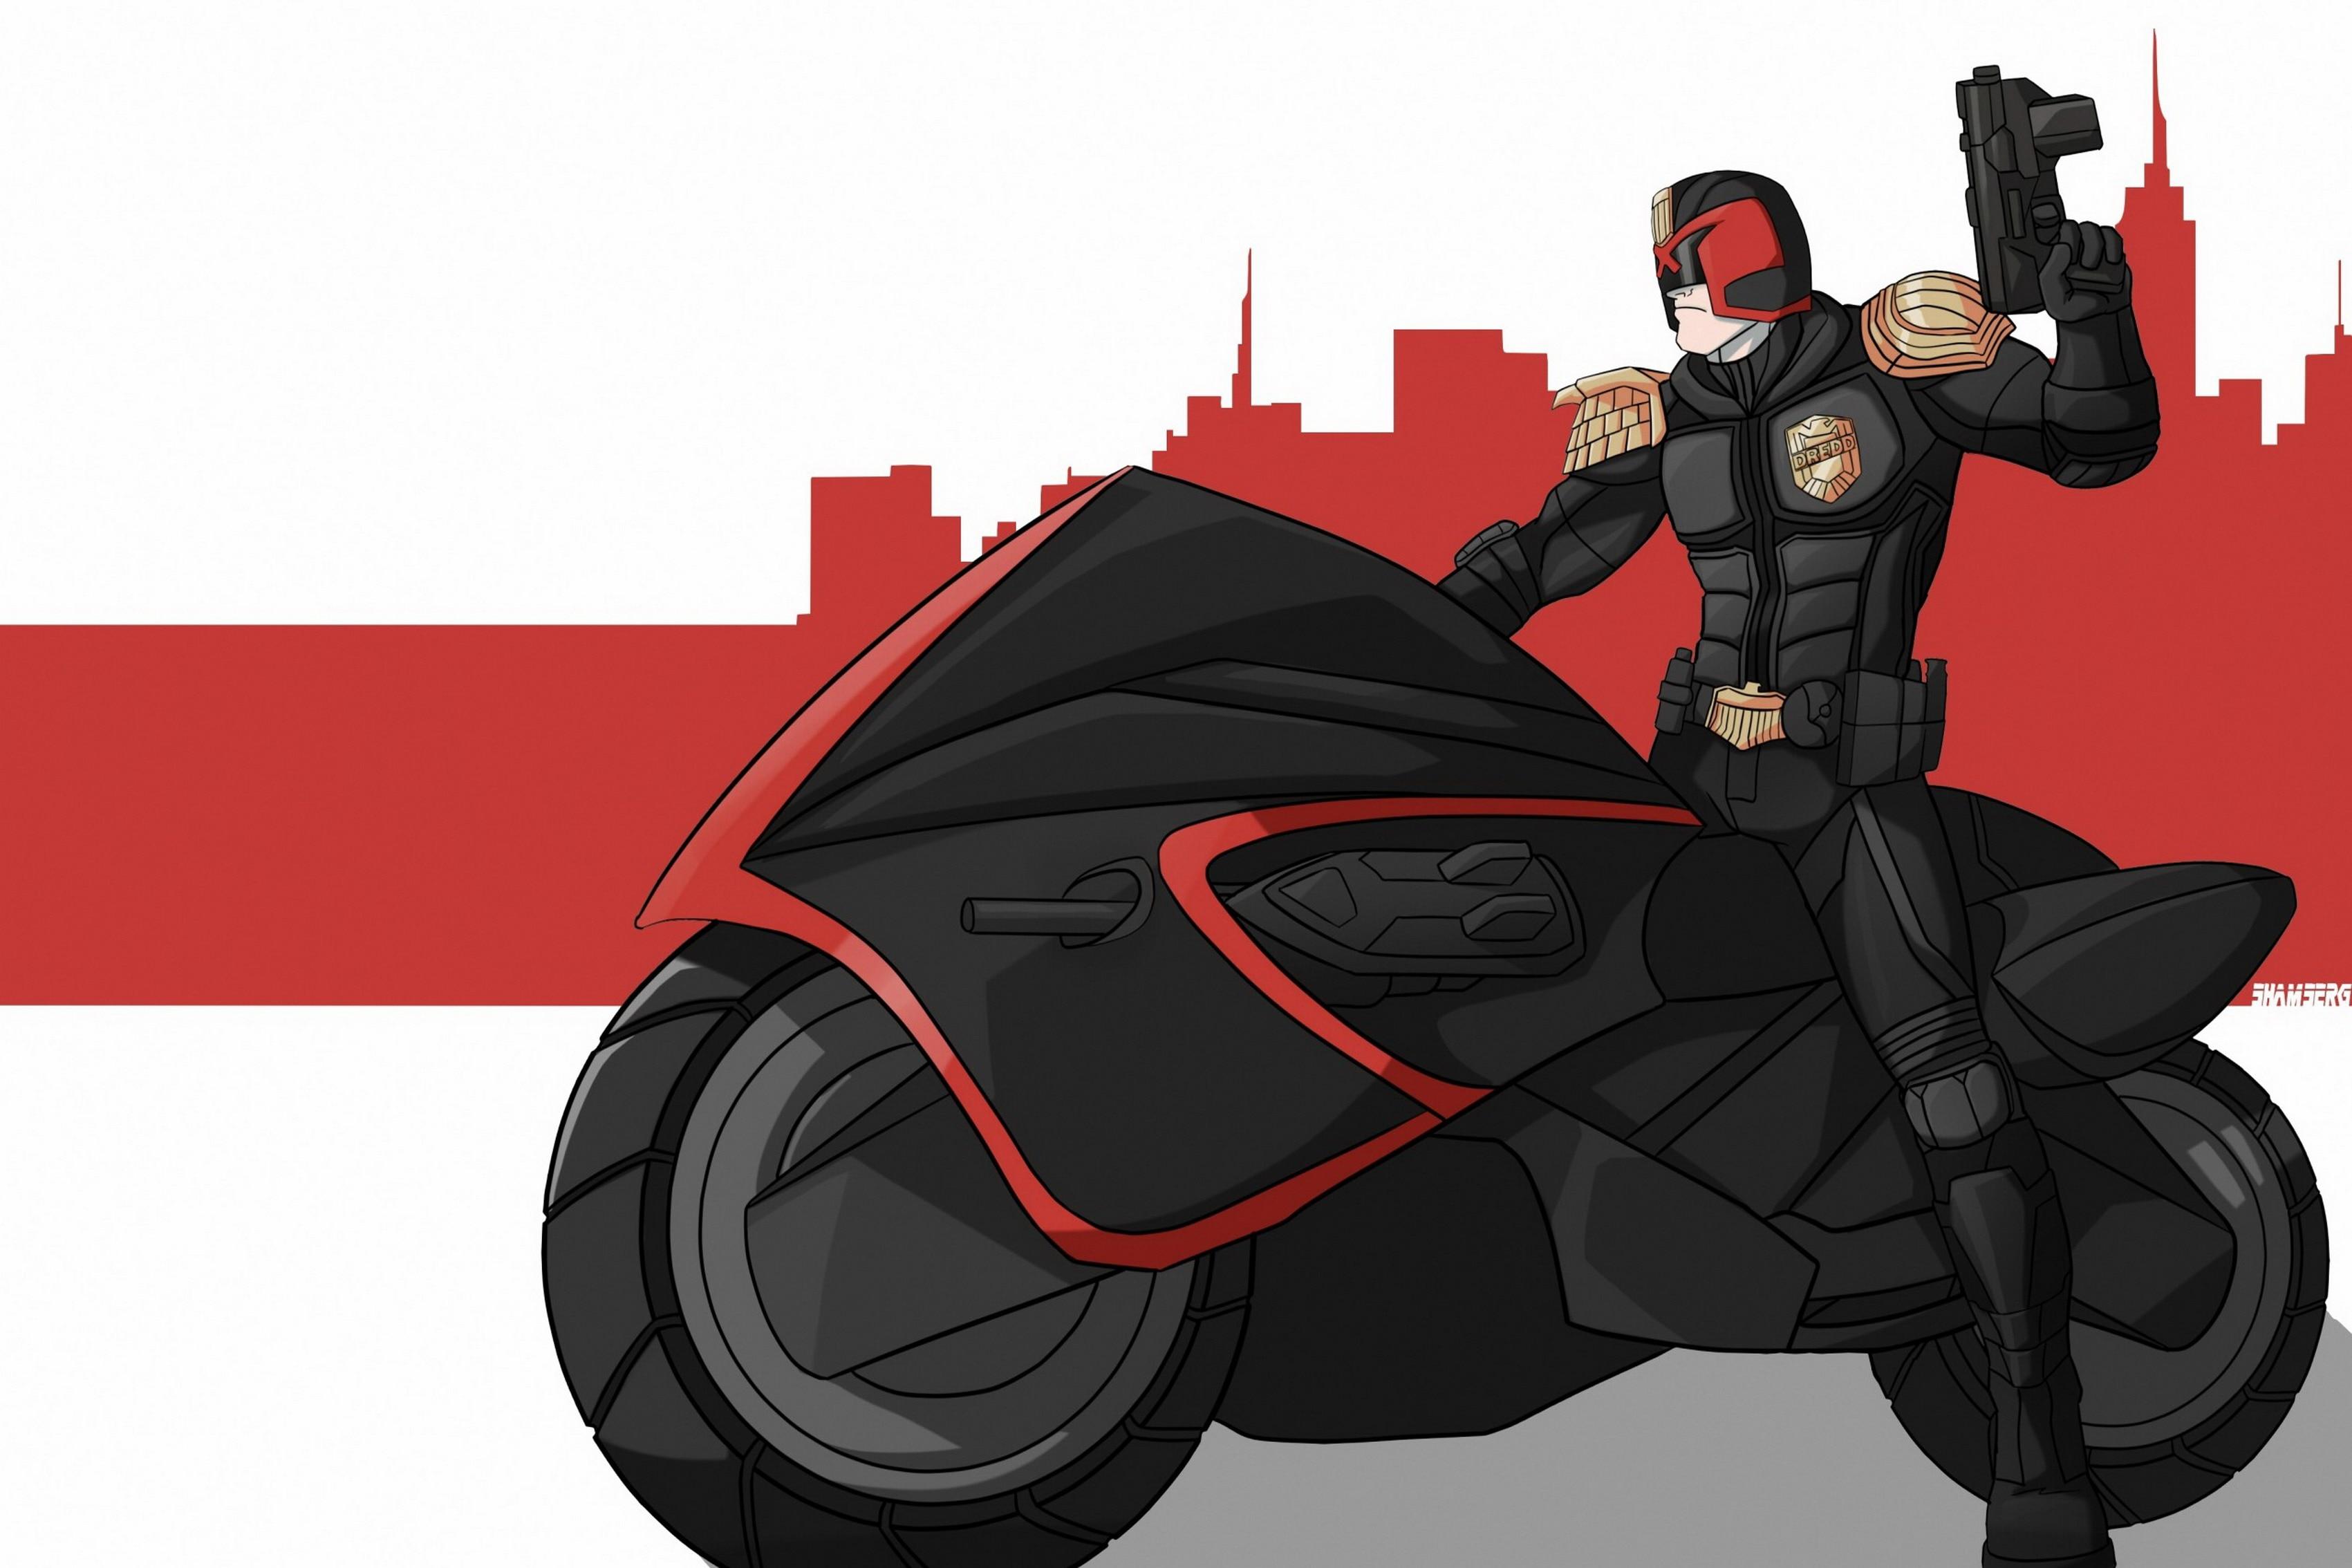 Home decoration fantasy motorcycle bike helmet gun art Silk Fabric Poster Print AT066